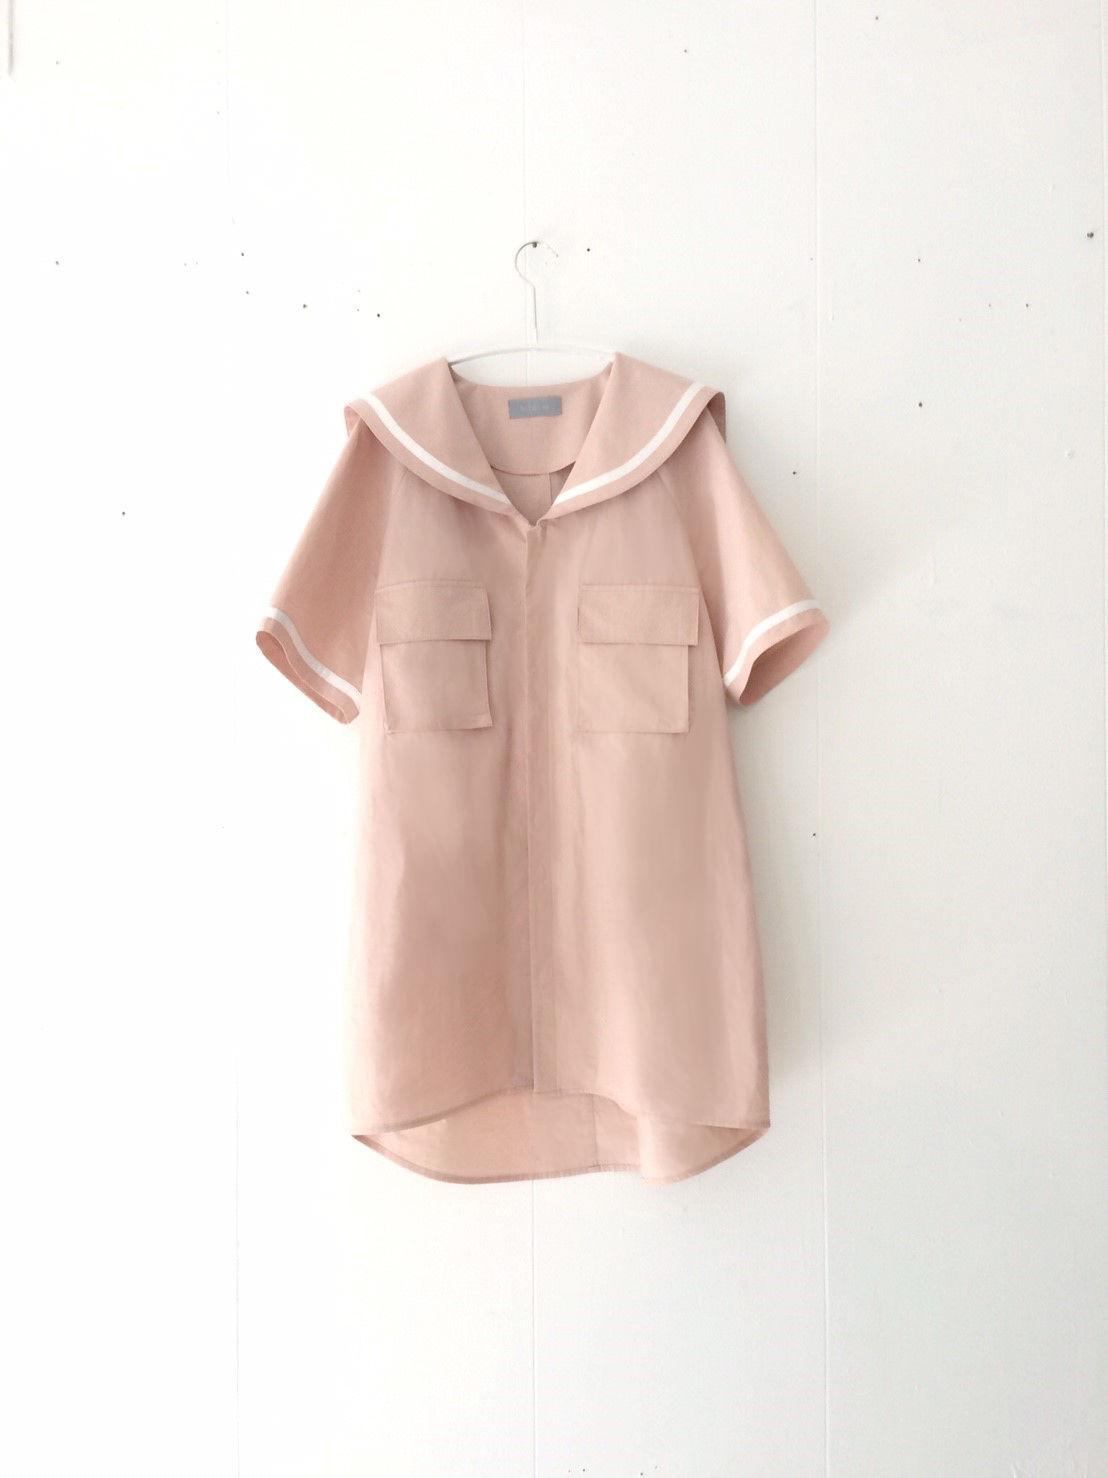 【 1/1~2/14 WEB受注受付中 】夏かしのセーラーカラーシャツ